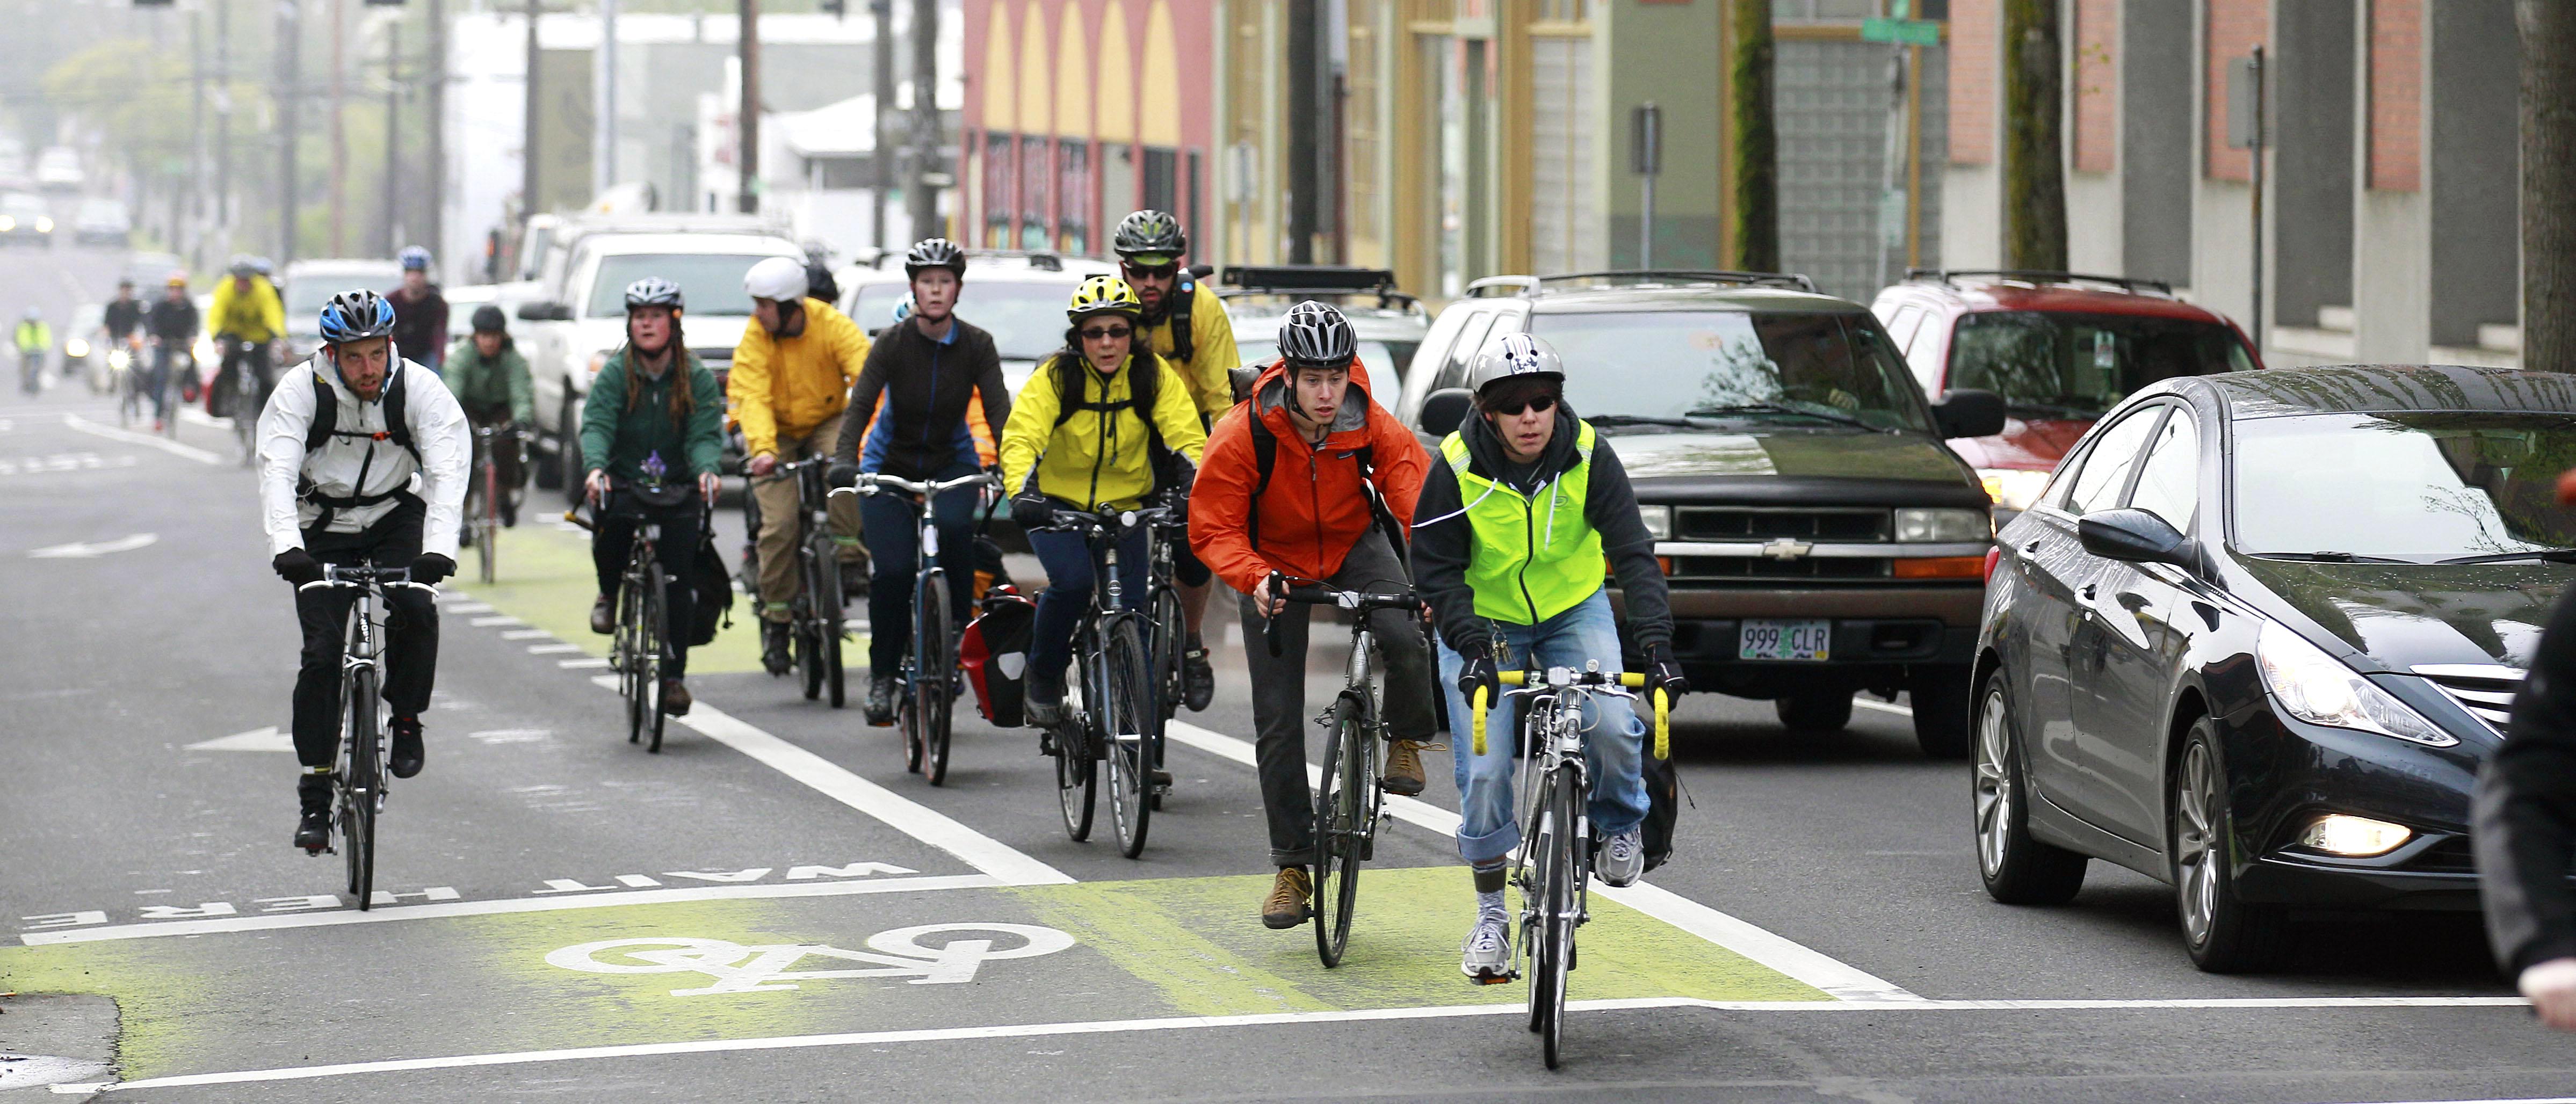 Group of people biking through city (© AP Images)